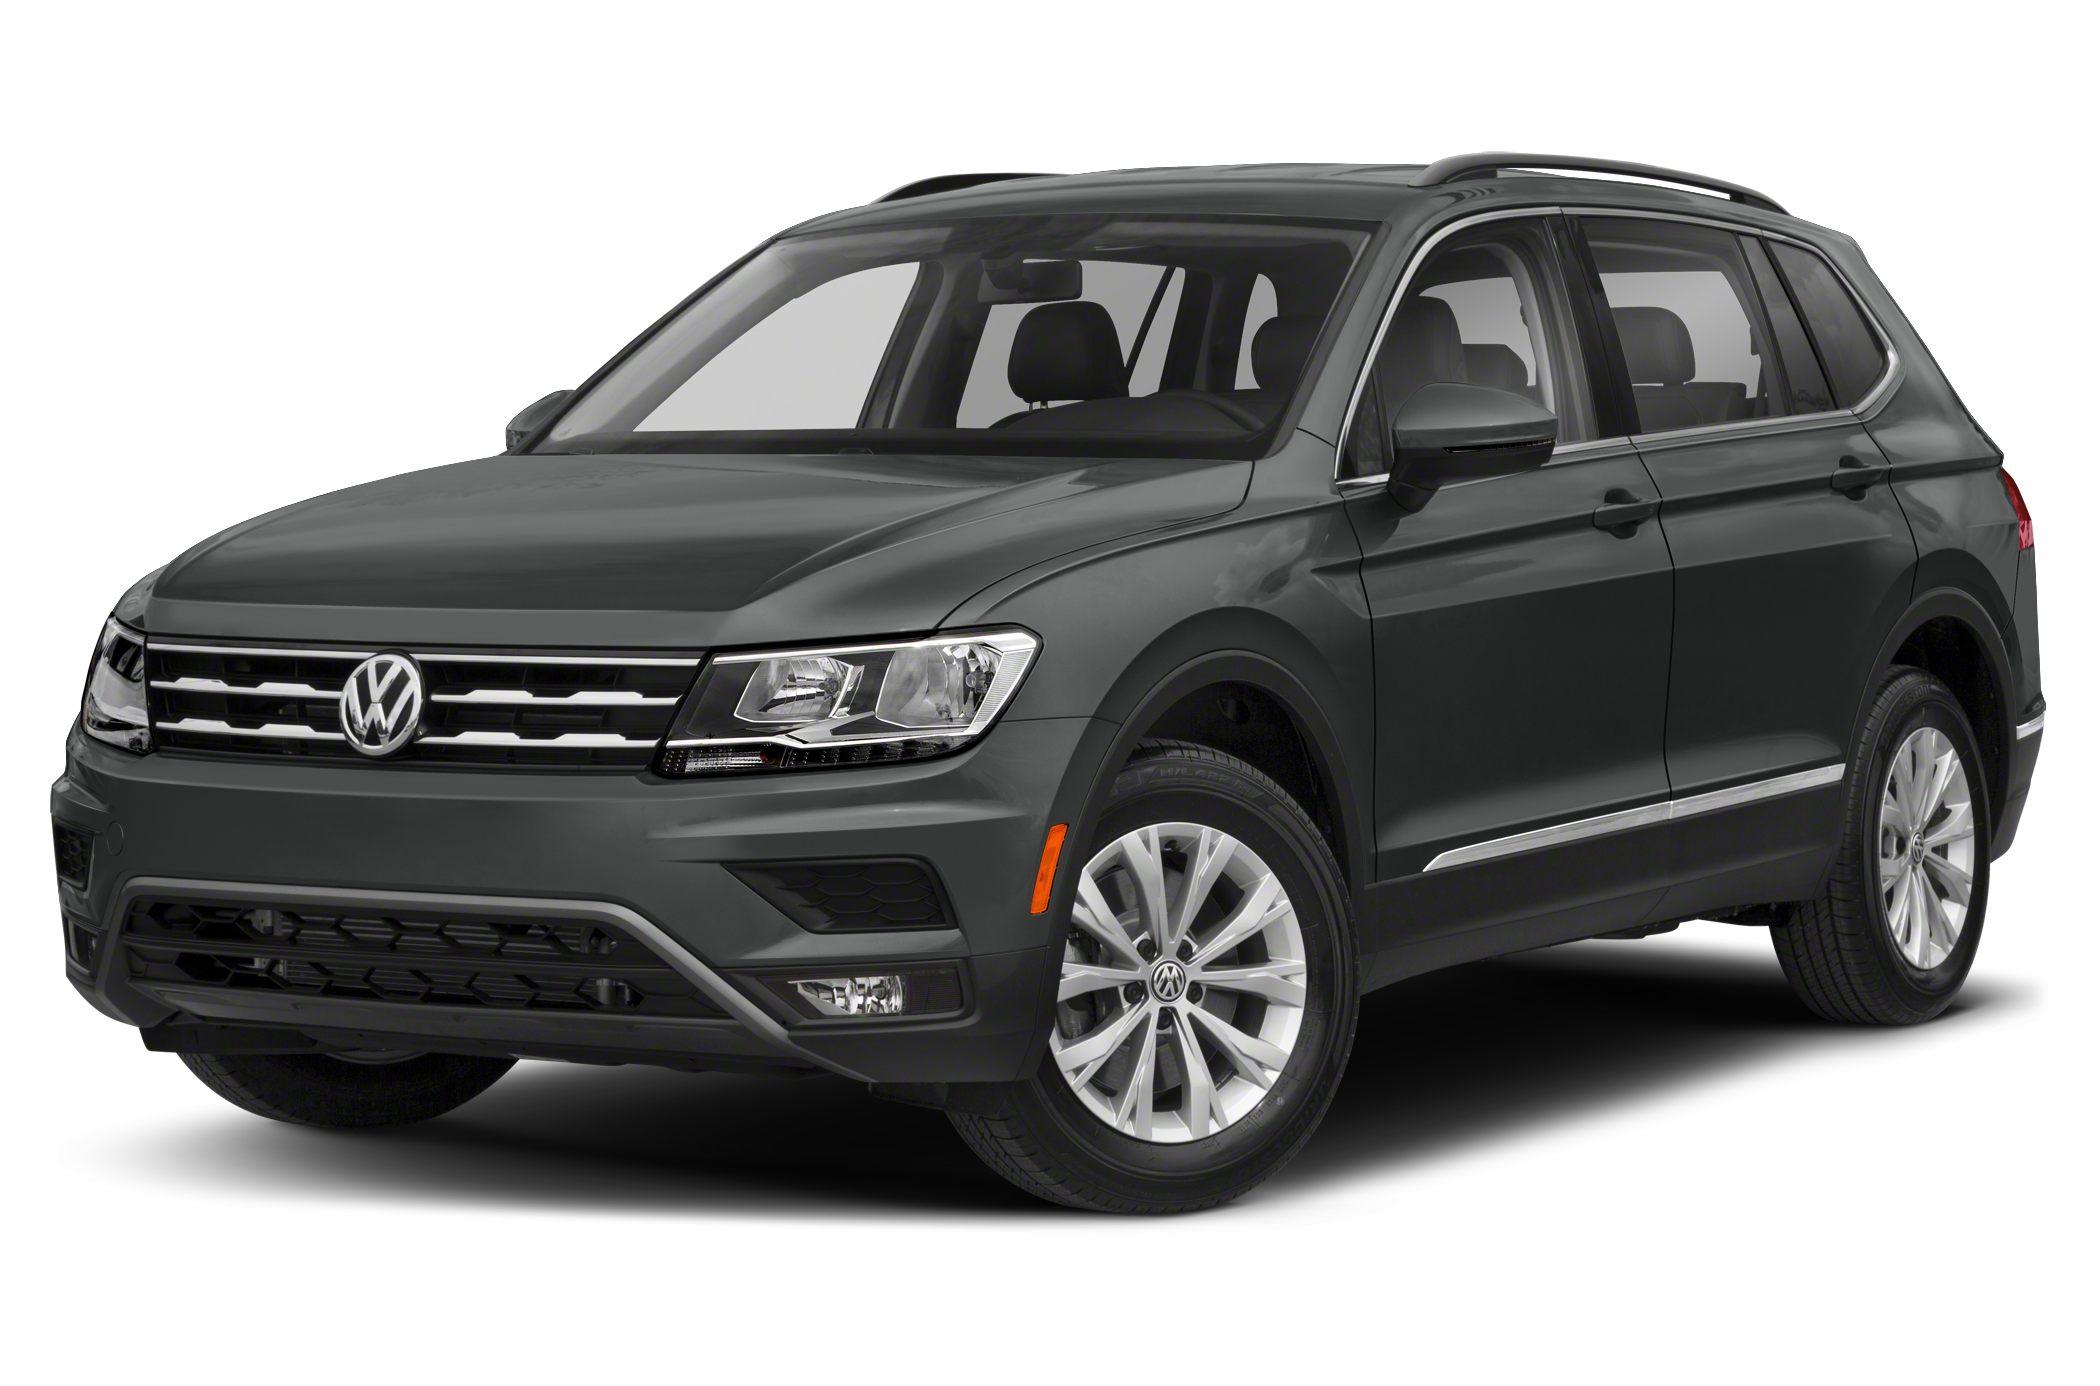 VW Tiguan grows up, gets bigger